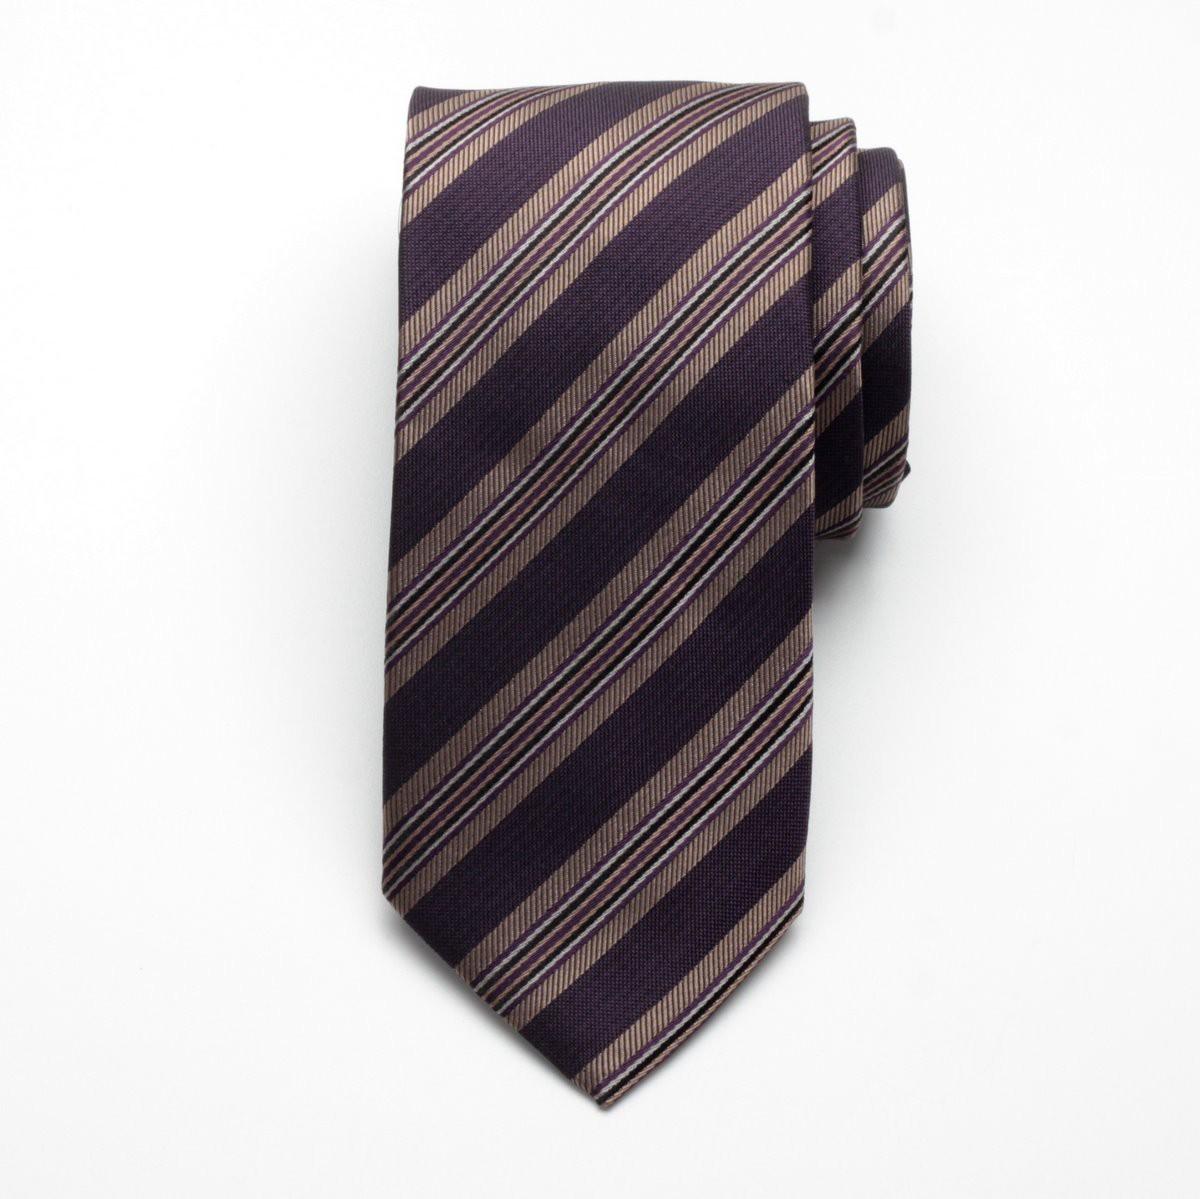 Krawat jedwabny Fine Selection (wzór 93)